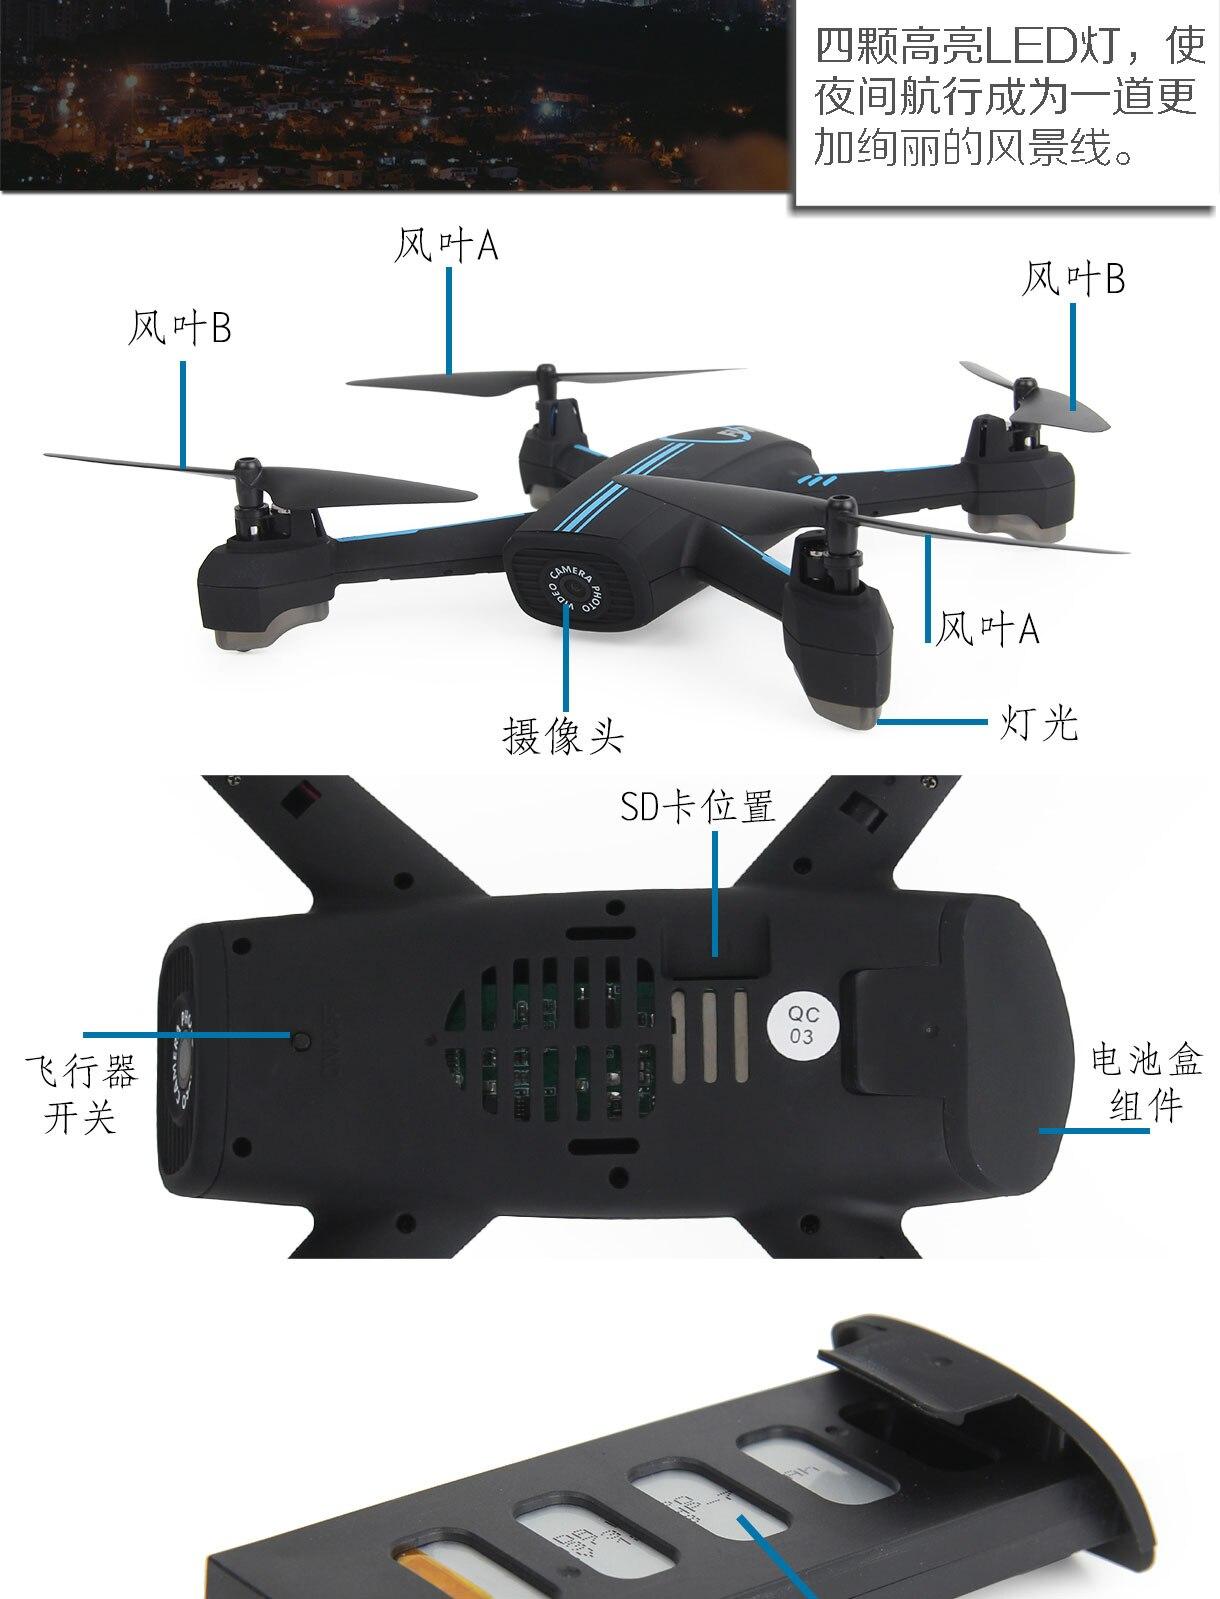 Wifi FPV RC Дрон gps горная точка Дрон 528 RC Квадрокоптер Full HD 720P камера один ключ Взлет/посадка/остановка стабильный полет - 6